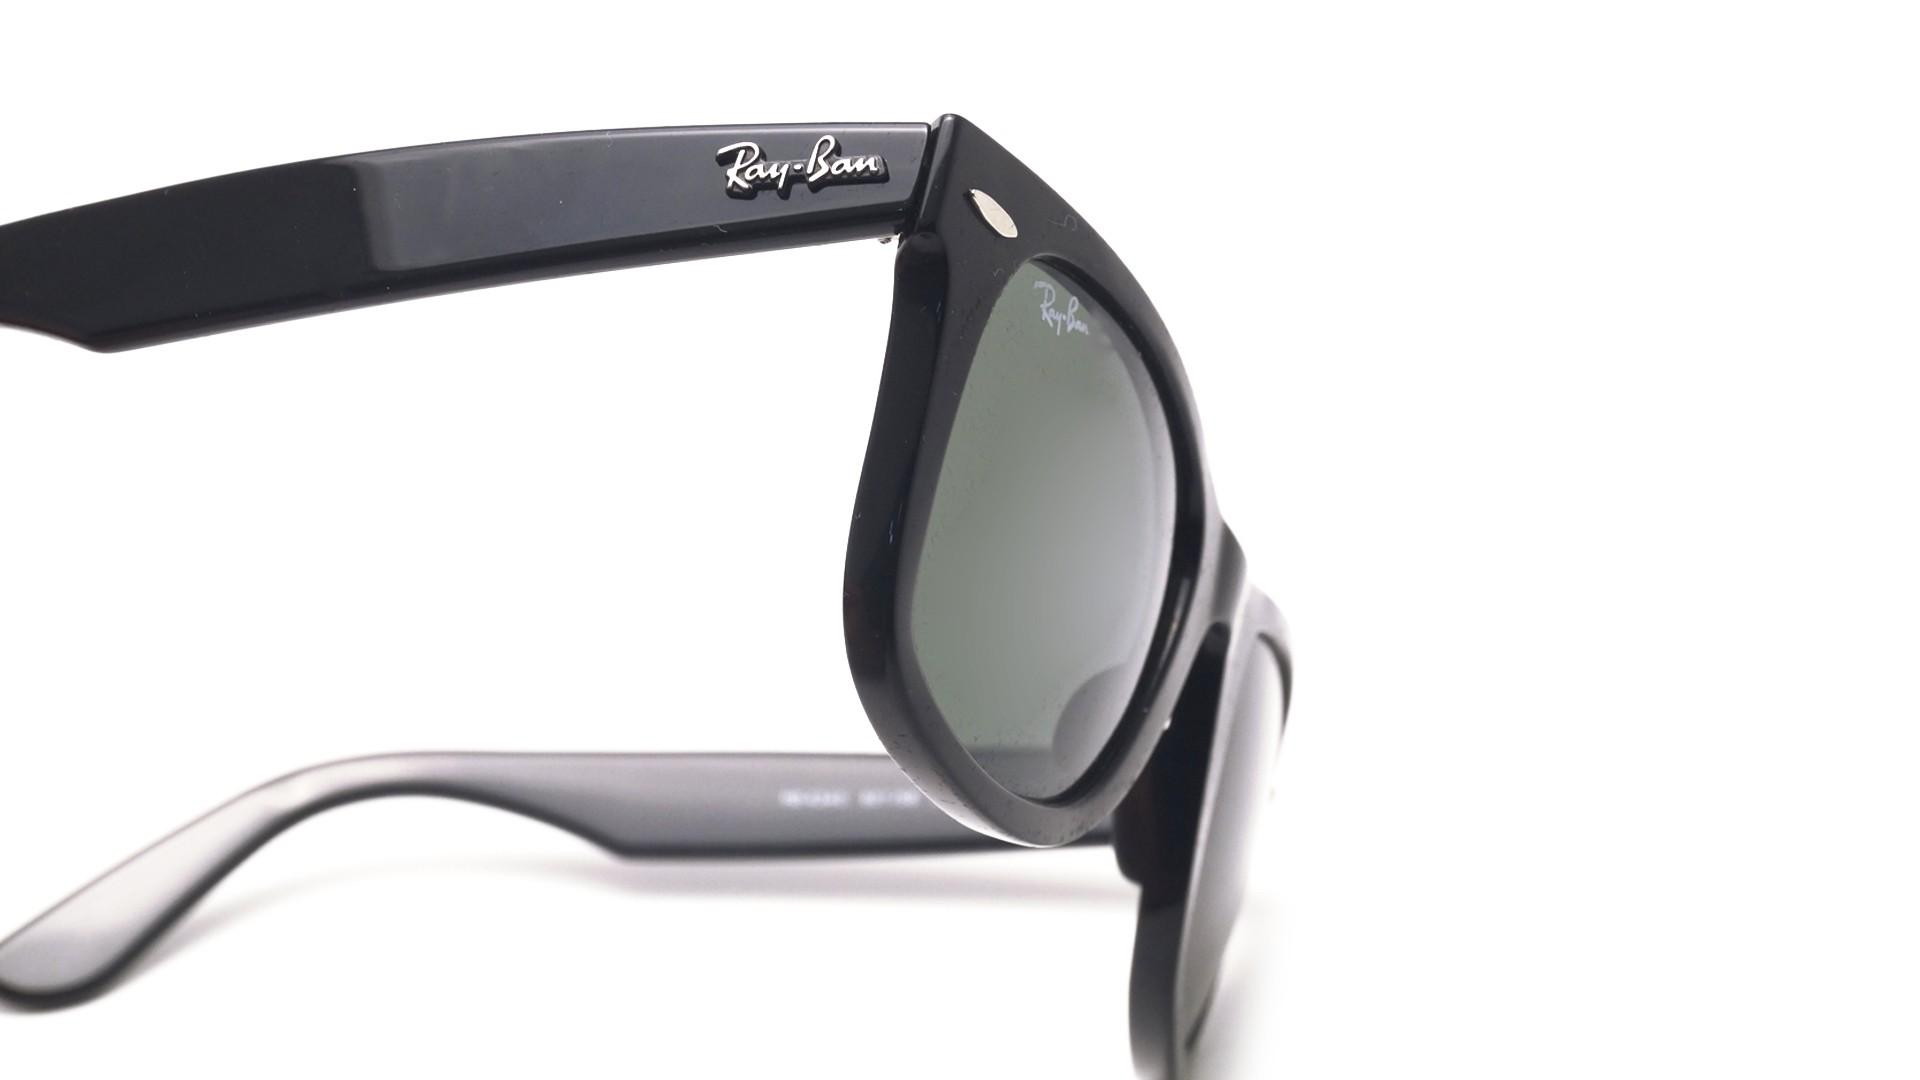 6d40e58f99 ... discount ray ban wayfarer ease black rb4340 601 50 22 visiofactory .  470df 26d56